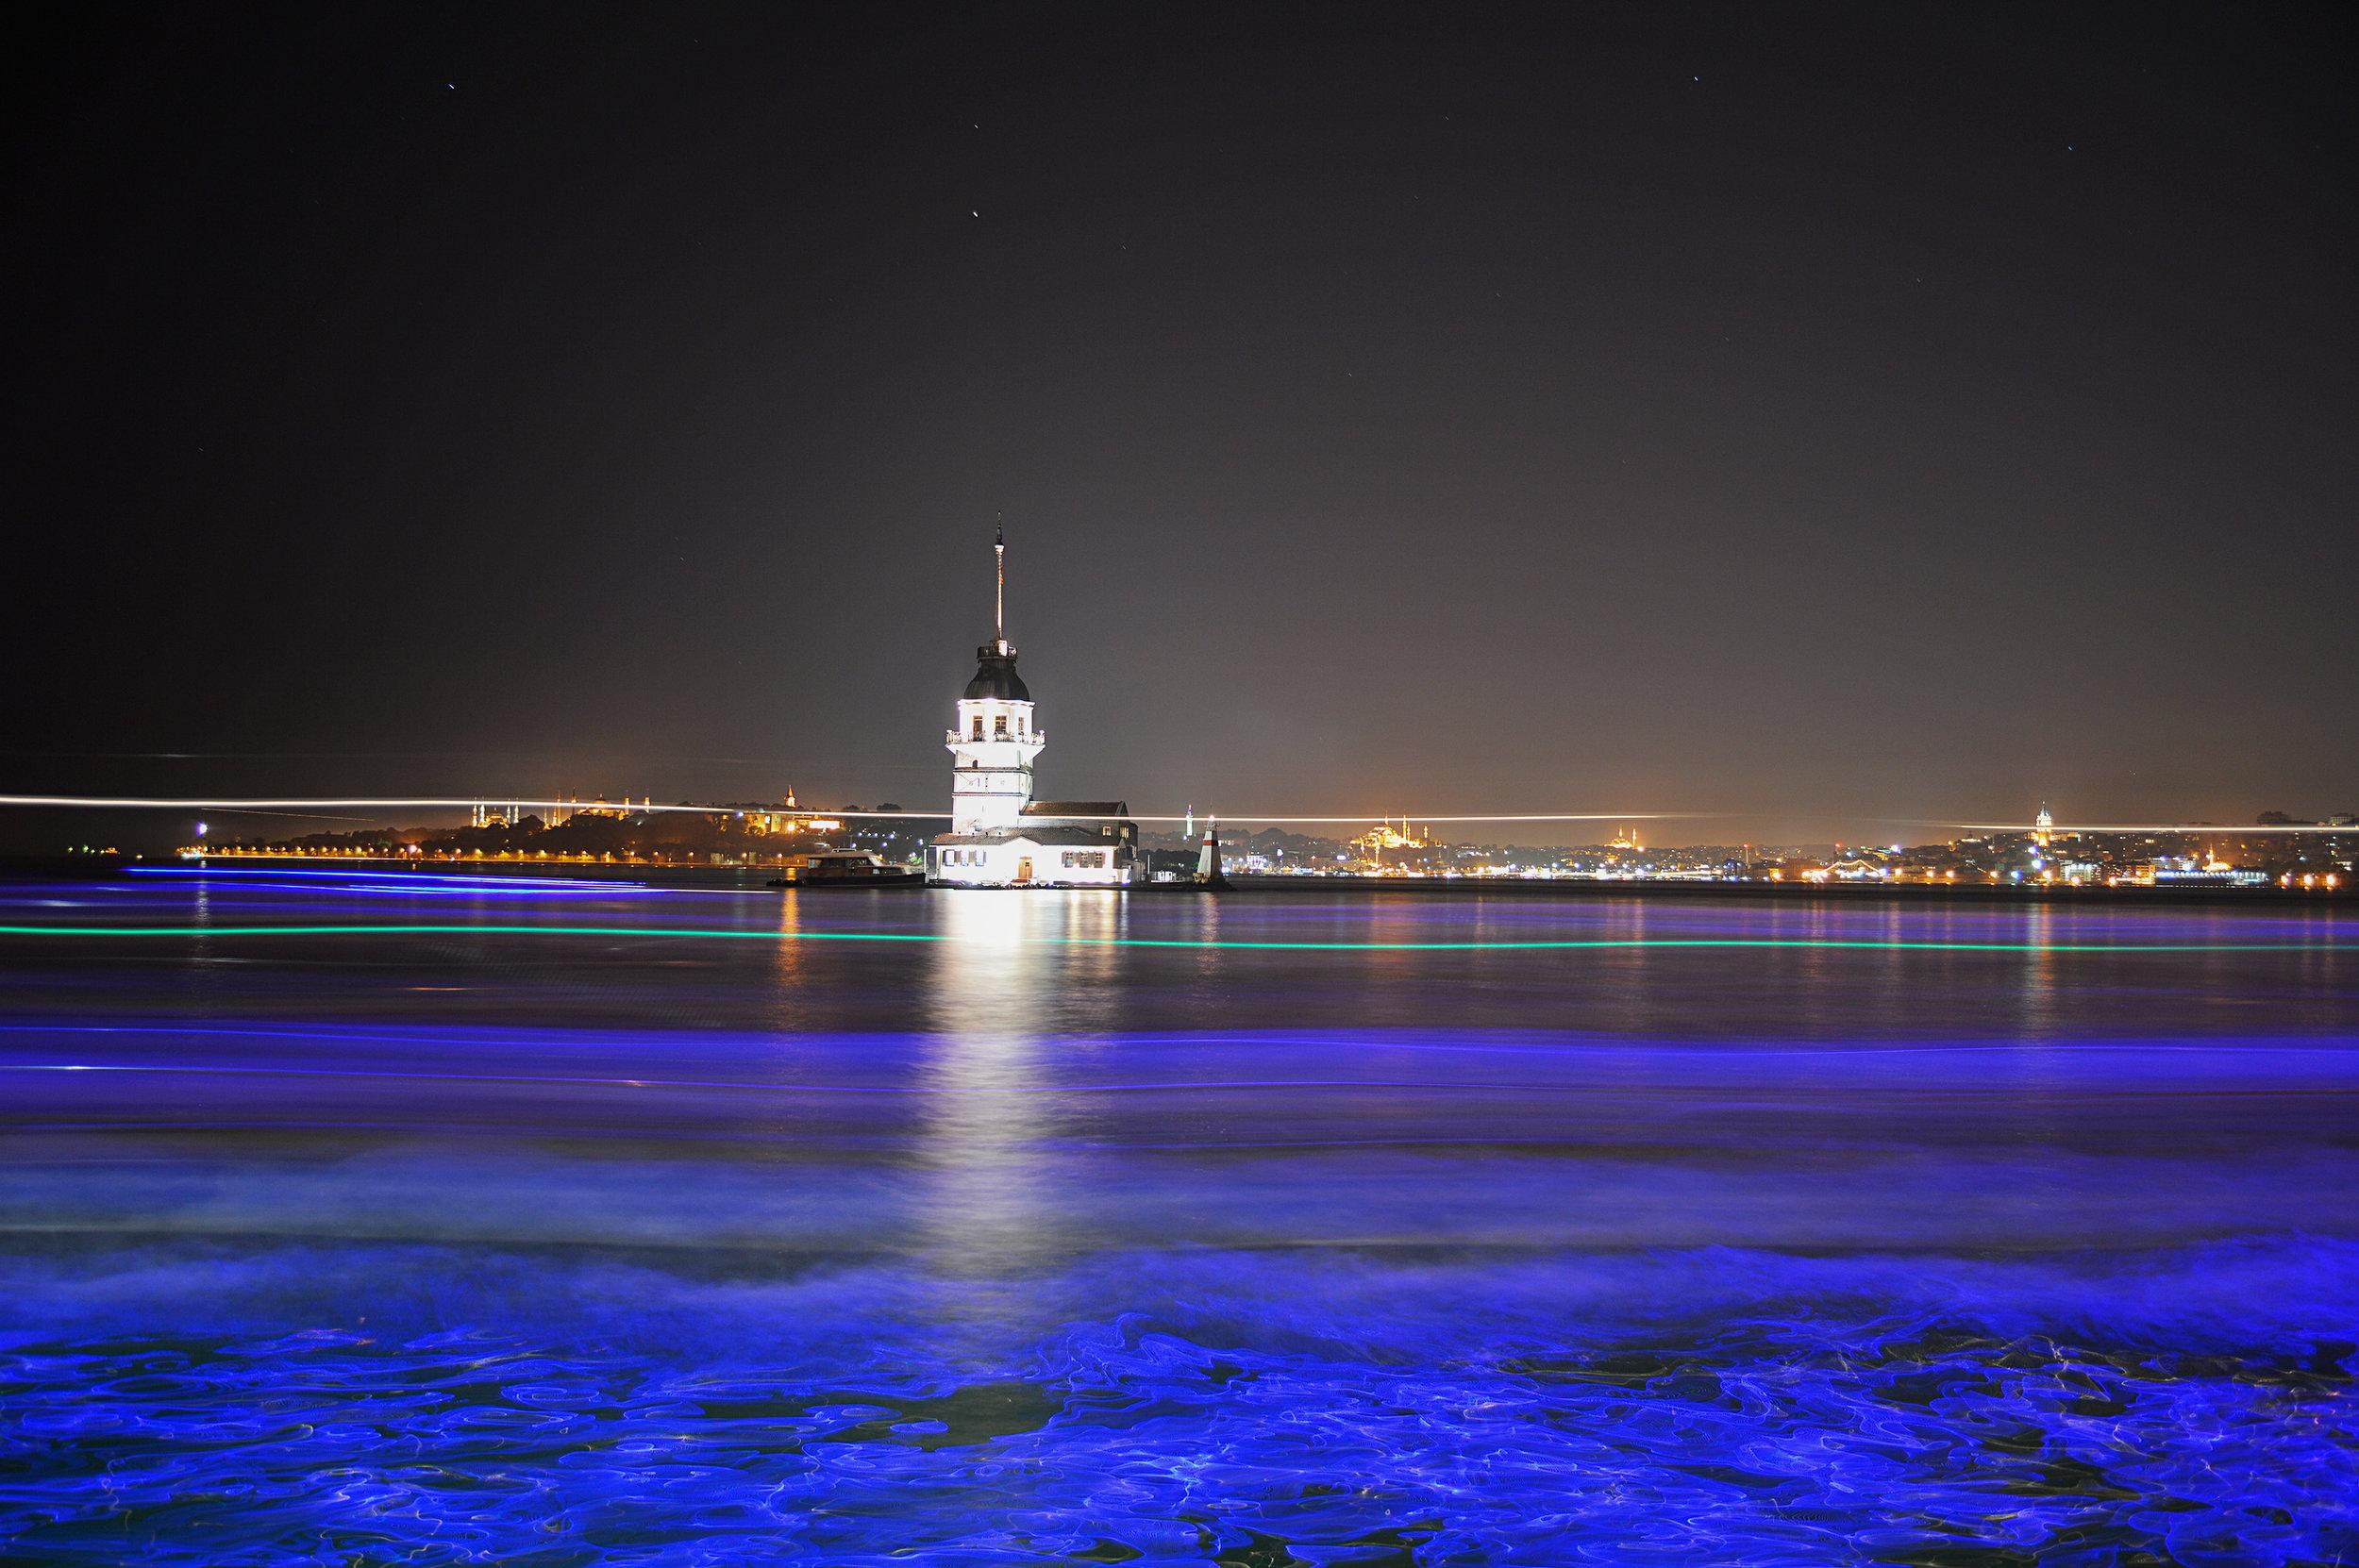 Maiden's Tower Skyline Bosporus Bosphorus Night Photography Long Exposure Sky Muslim Ottoman Empire Architecture Istanbul Turkey